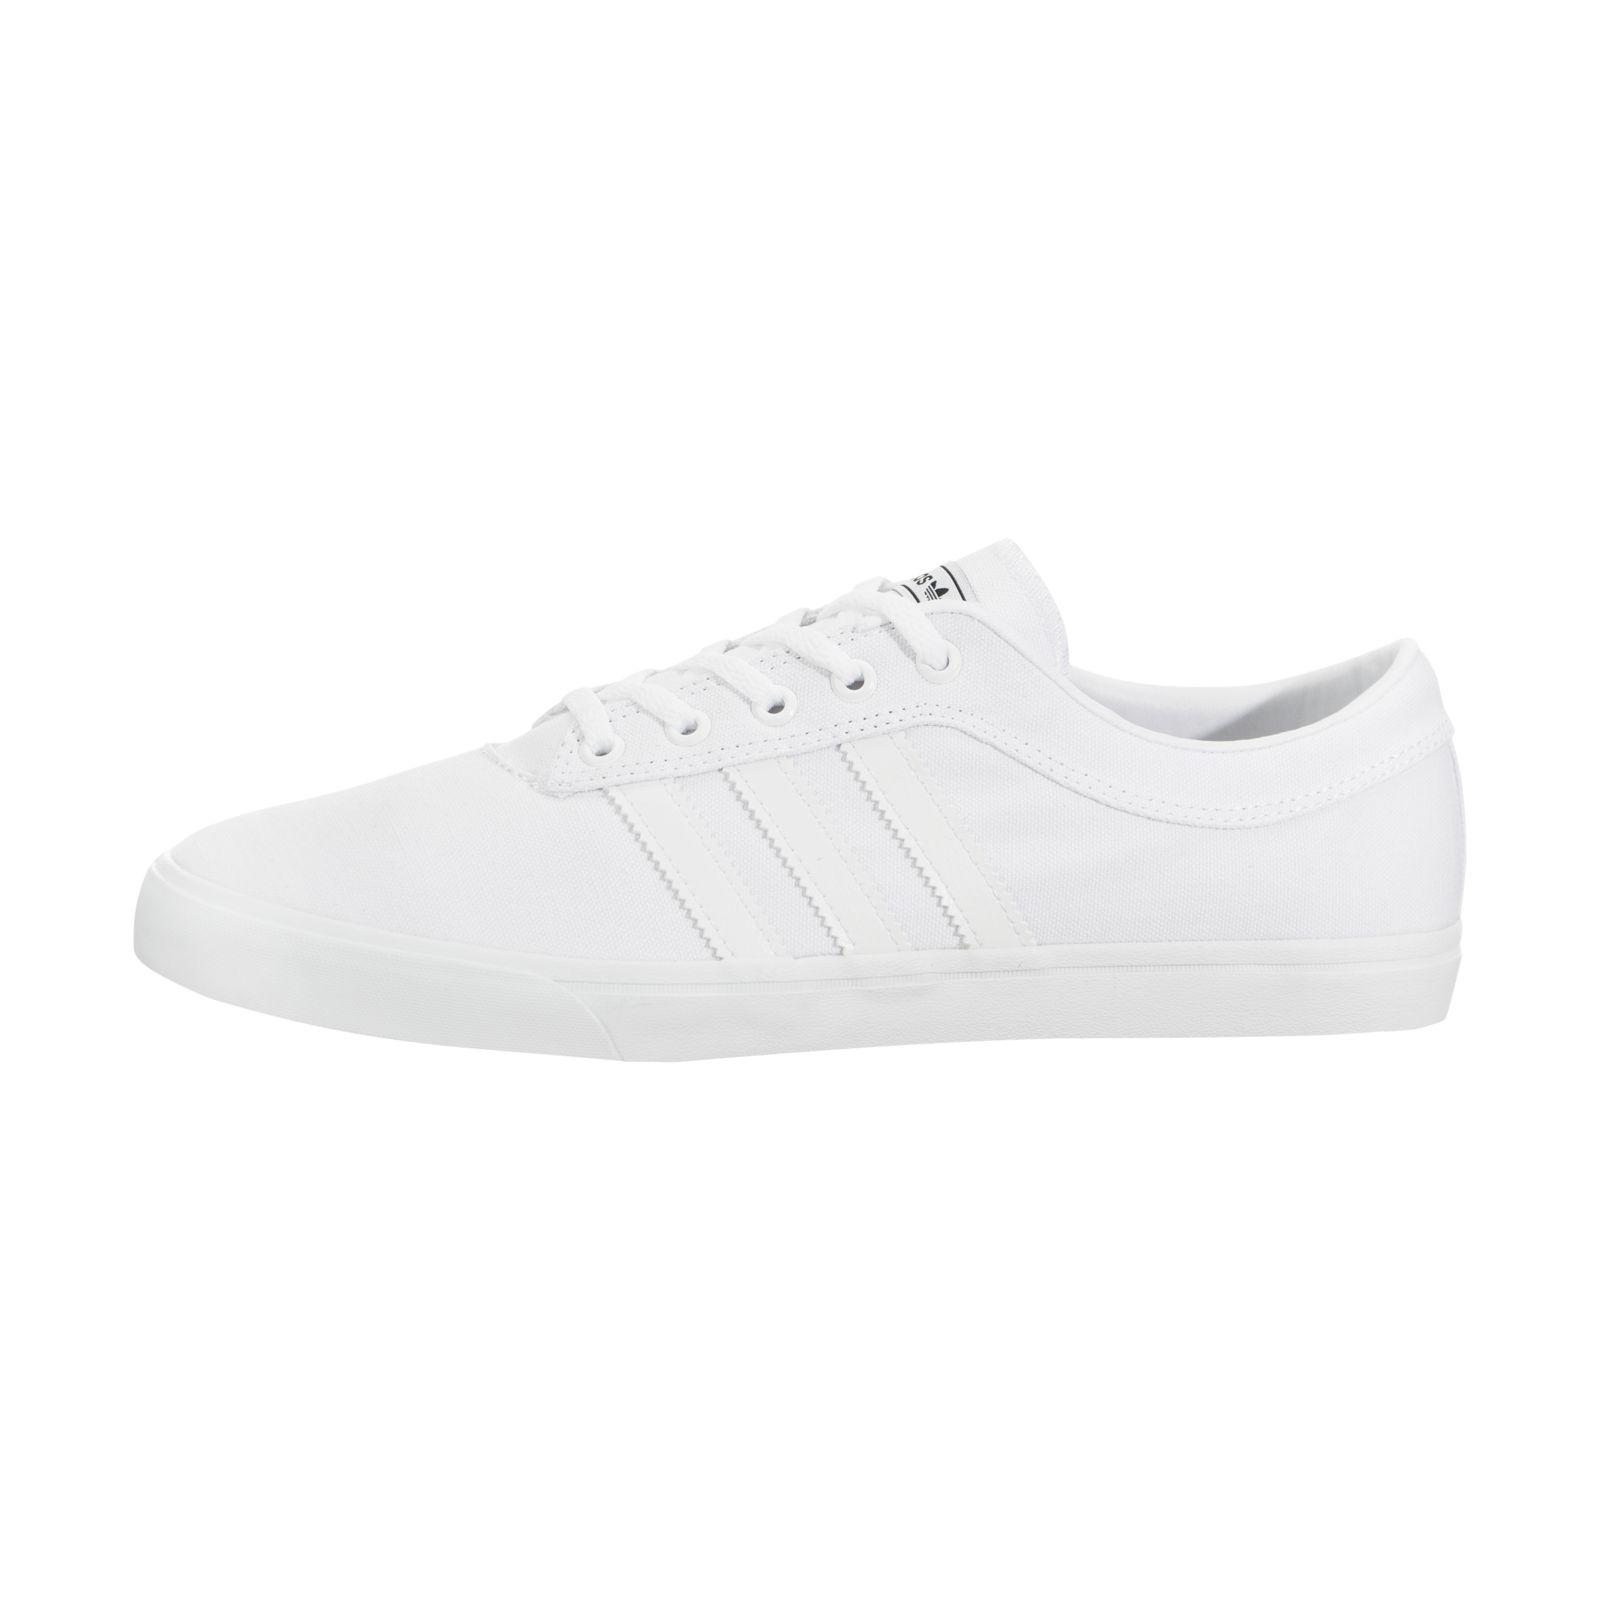 Brand New Mens sz 10.5 Adidas Sellwood Athletic Skateboarding Shoes